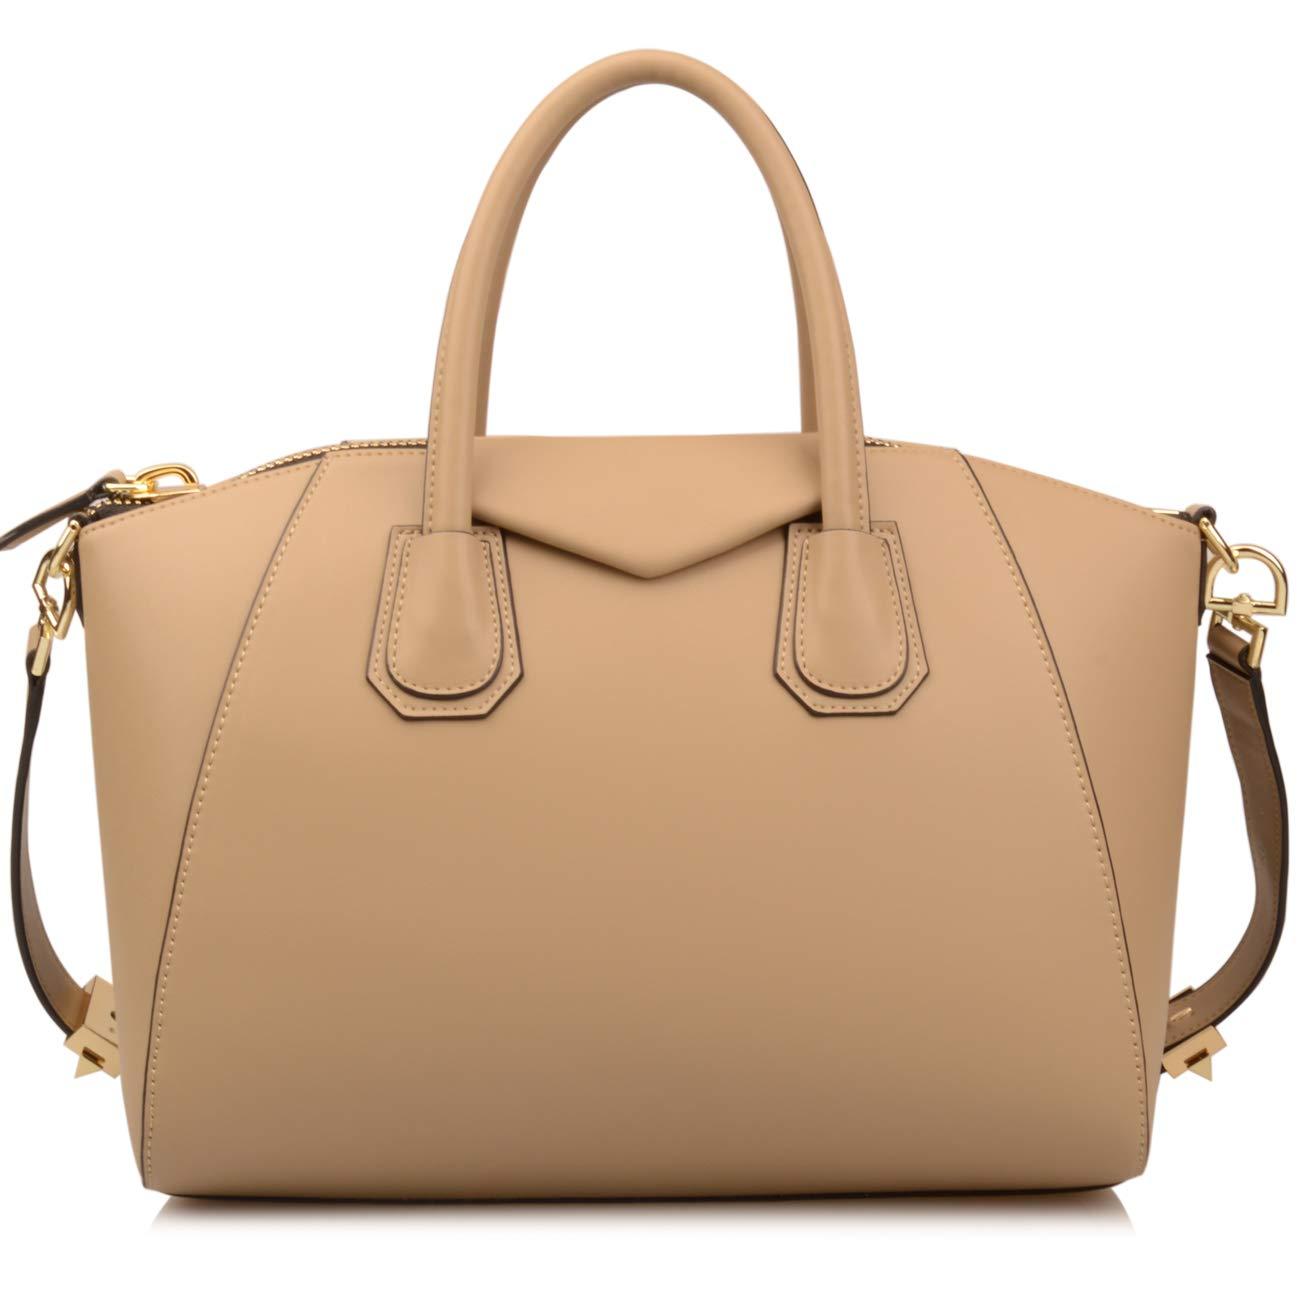 Ainifeel Women's Genuine Leather Everyday Purse Top Handle Handbags Shoulder Bags (Medium, Taupe)